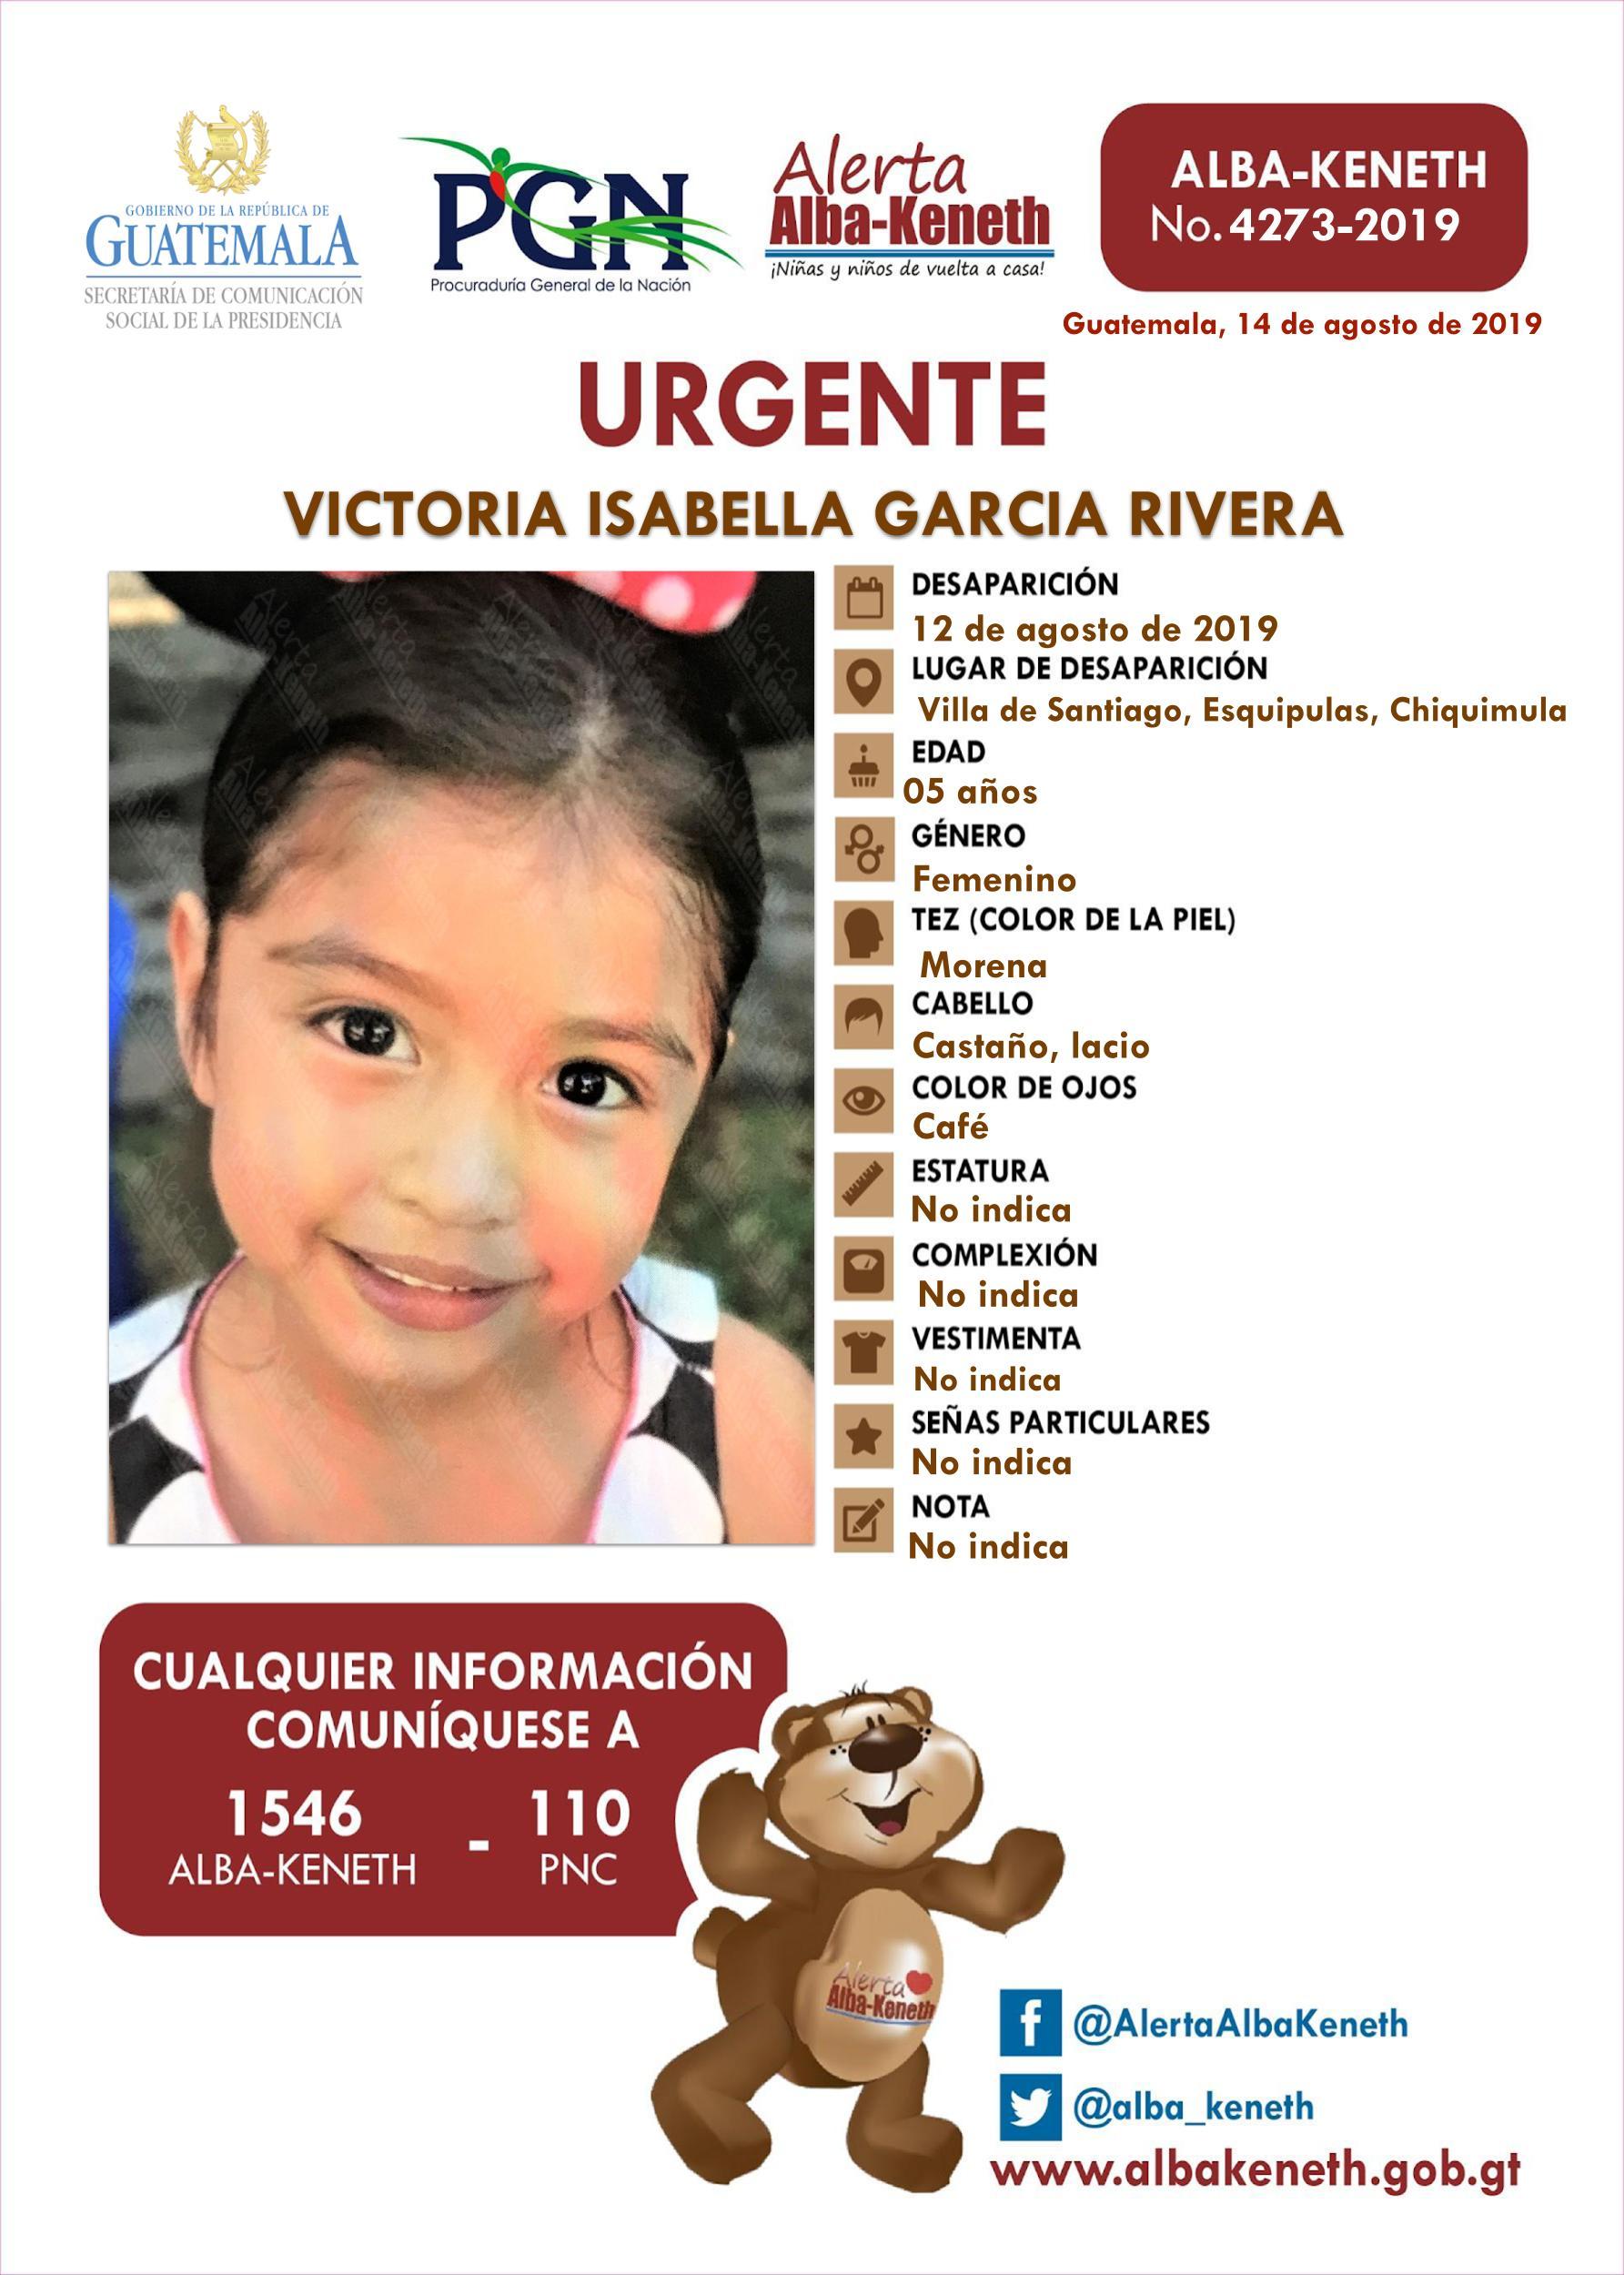 Victoria Isabella Garcia Rivera